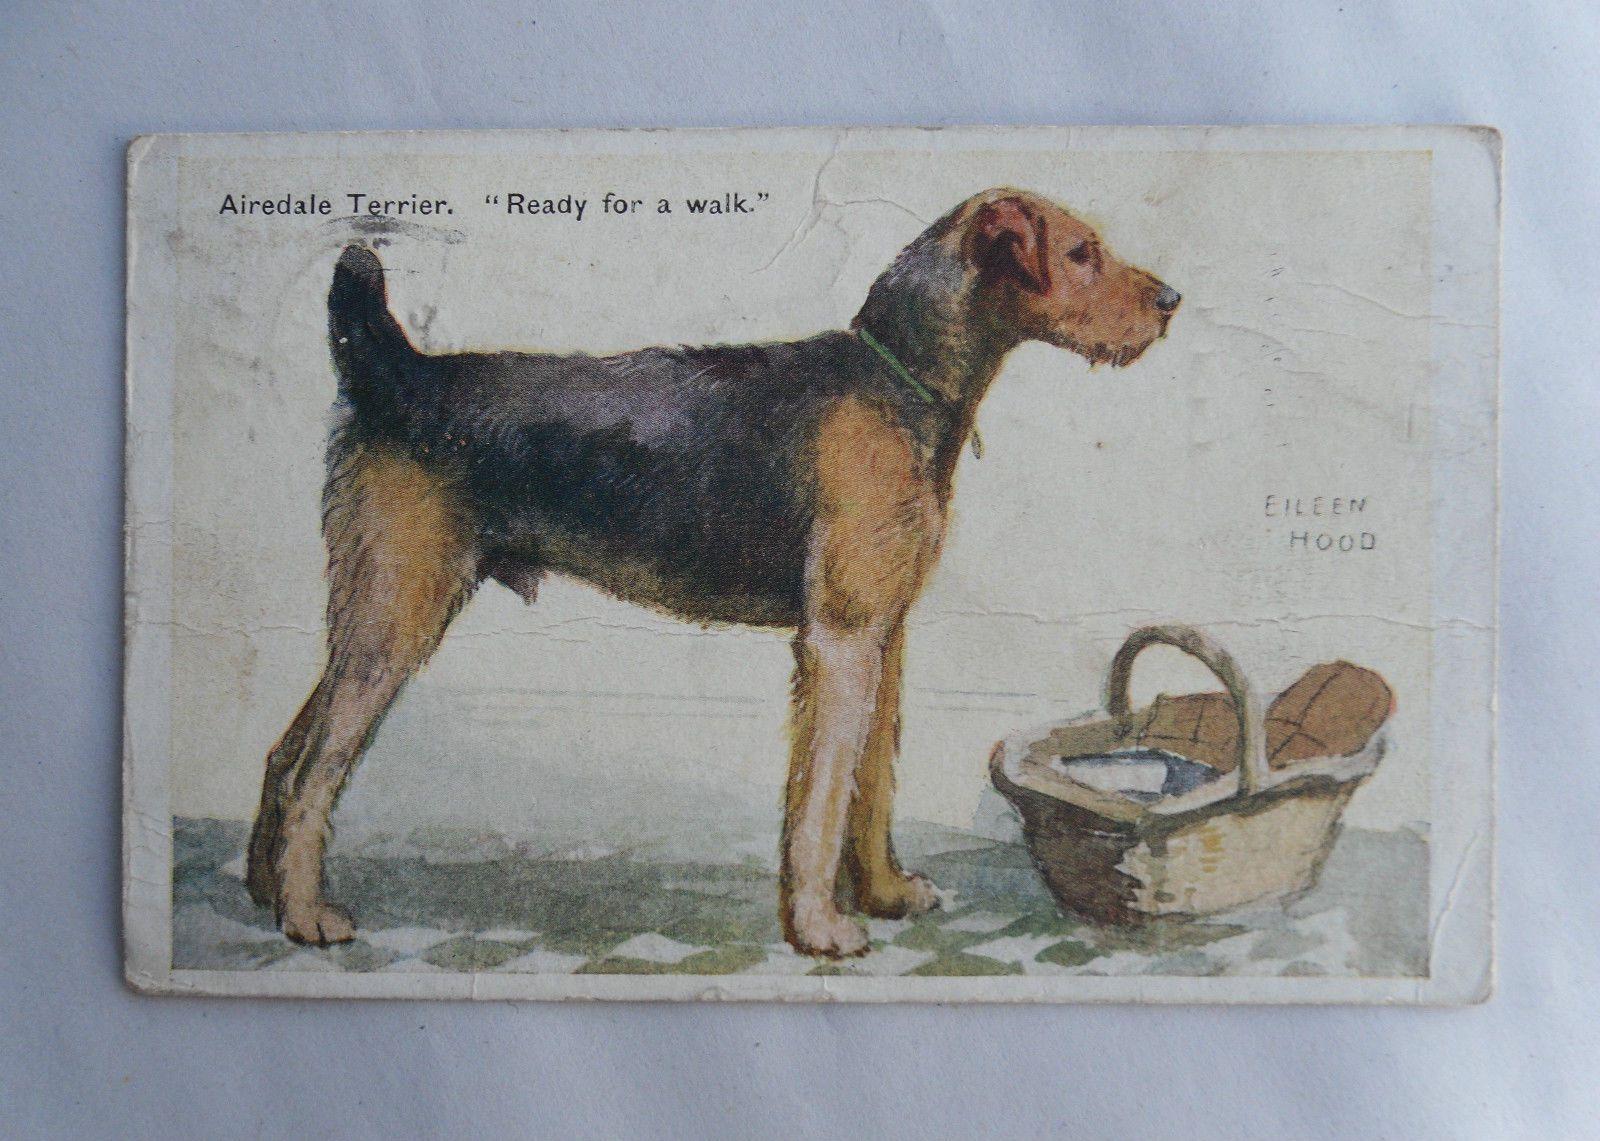 1925 Colour Postcard Airedale Terrier Ready For A Walk Eileen